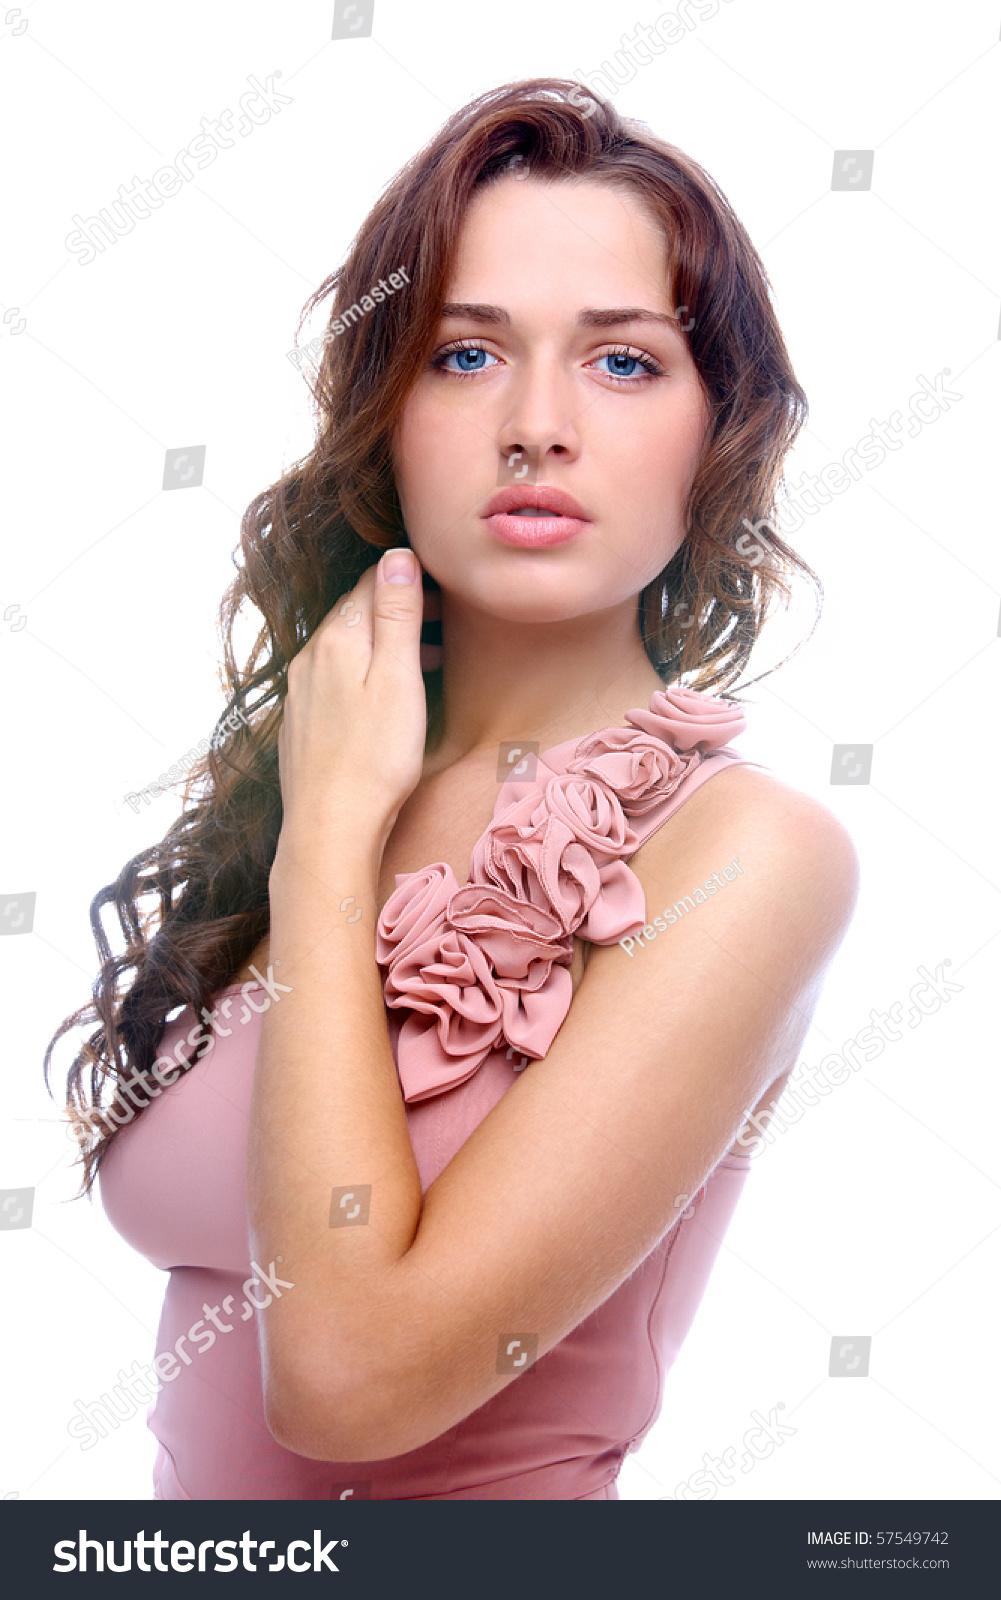 Portrait Of Elegant Woman In Smart Dress Looking At Camera Stock Photo 57549742 : Shutterstock